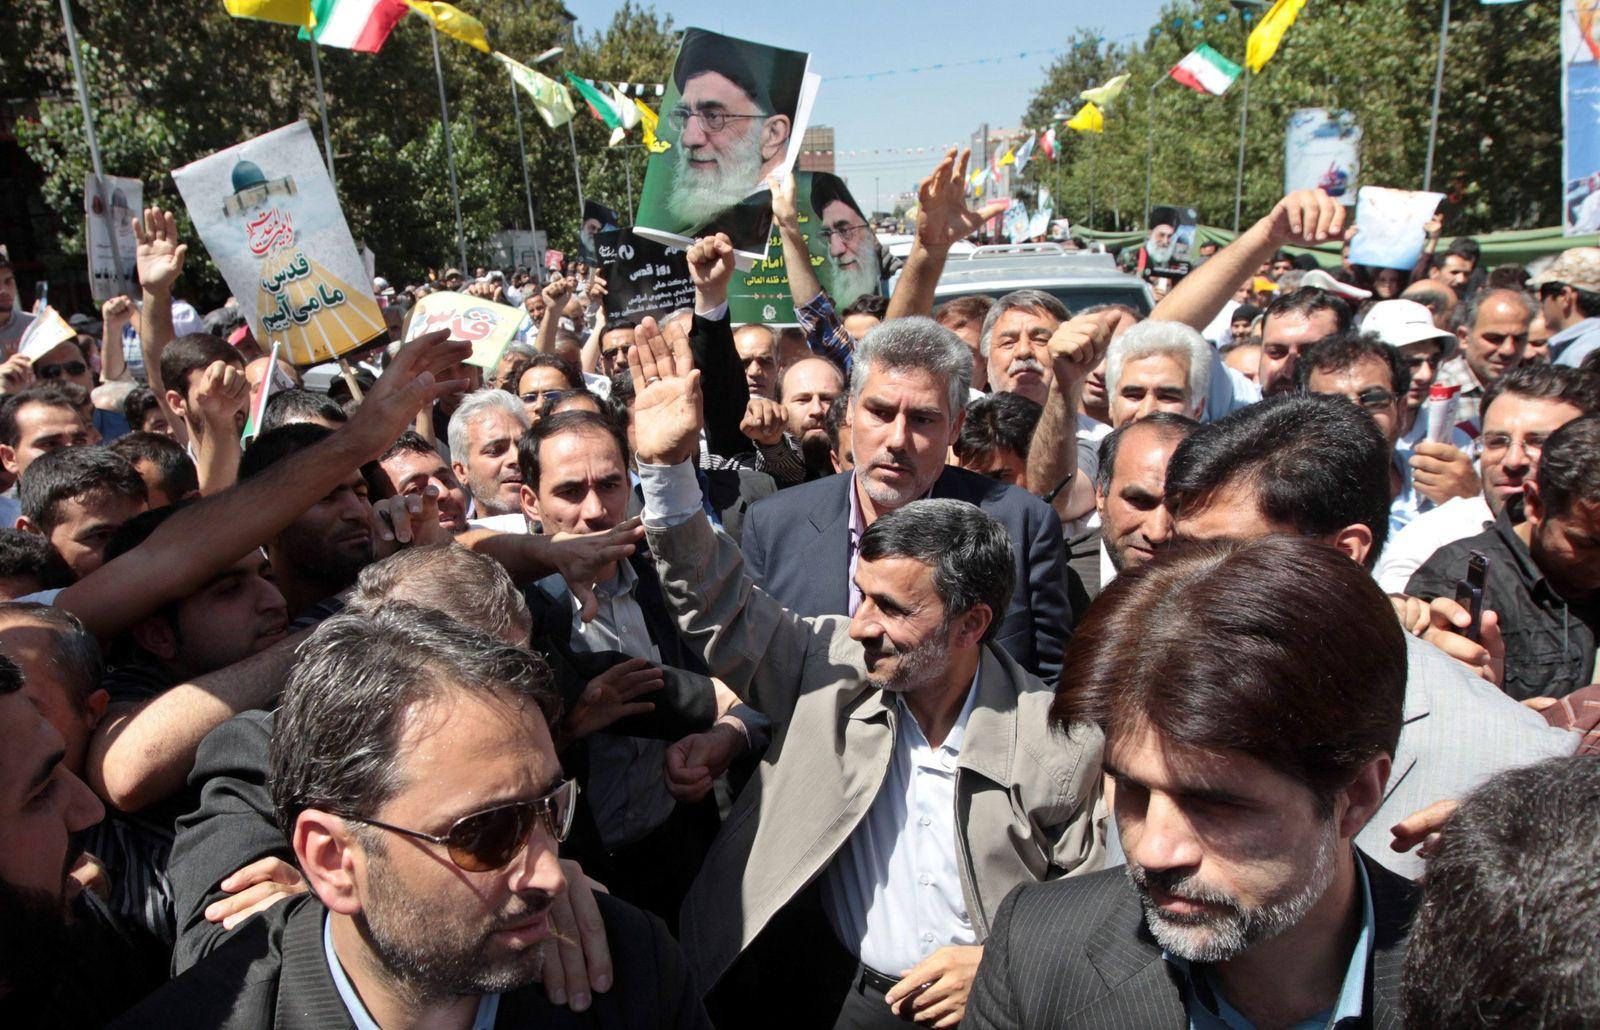 Anti-Israel-Demo / Iran / Ahmadinedschad